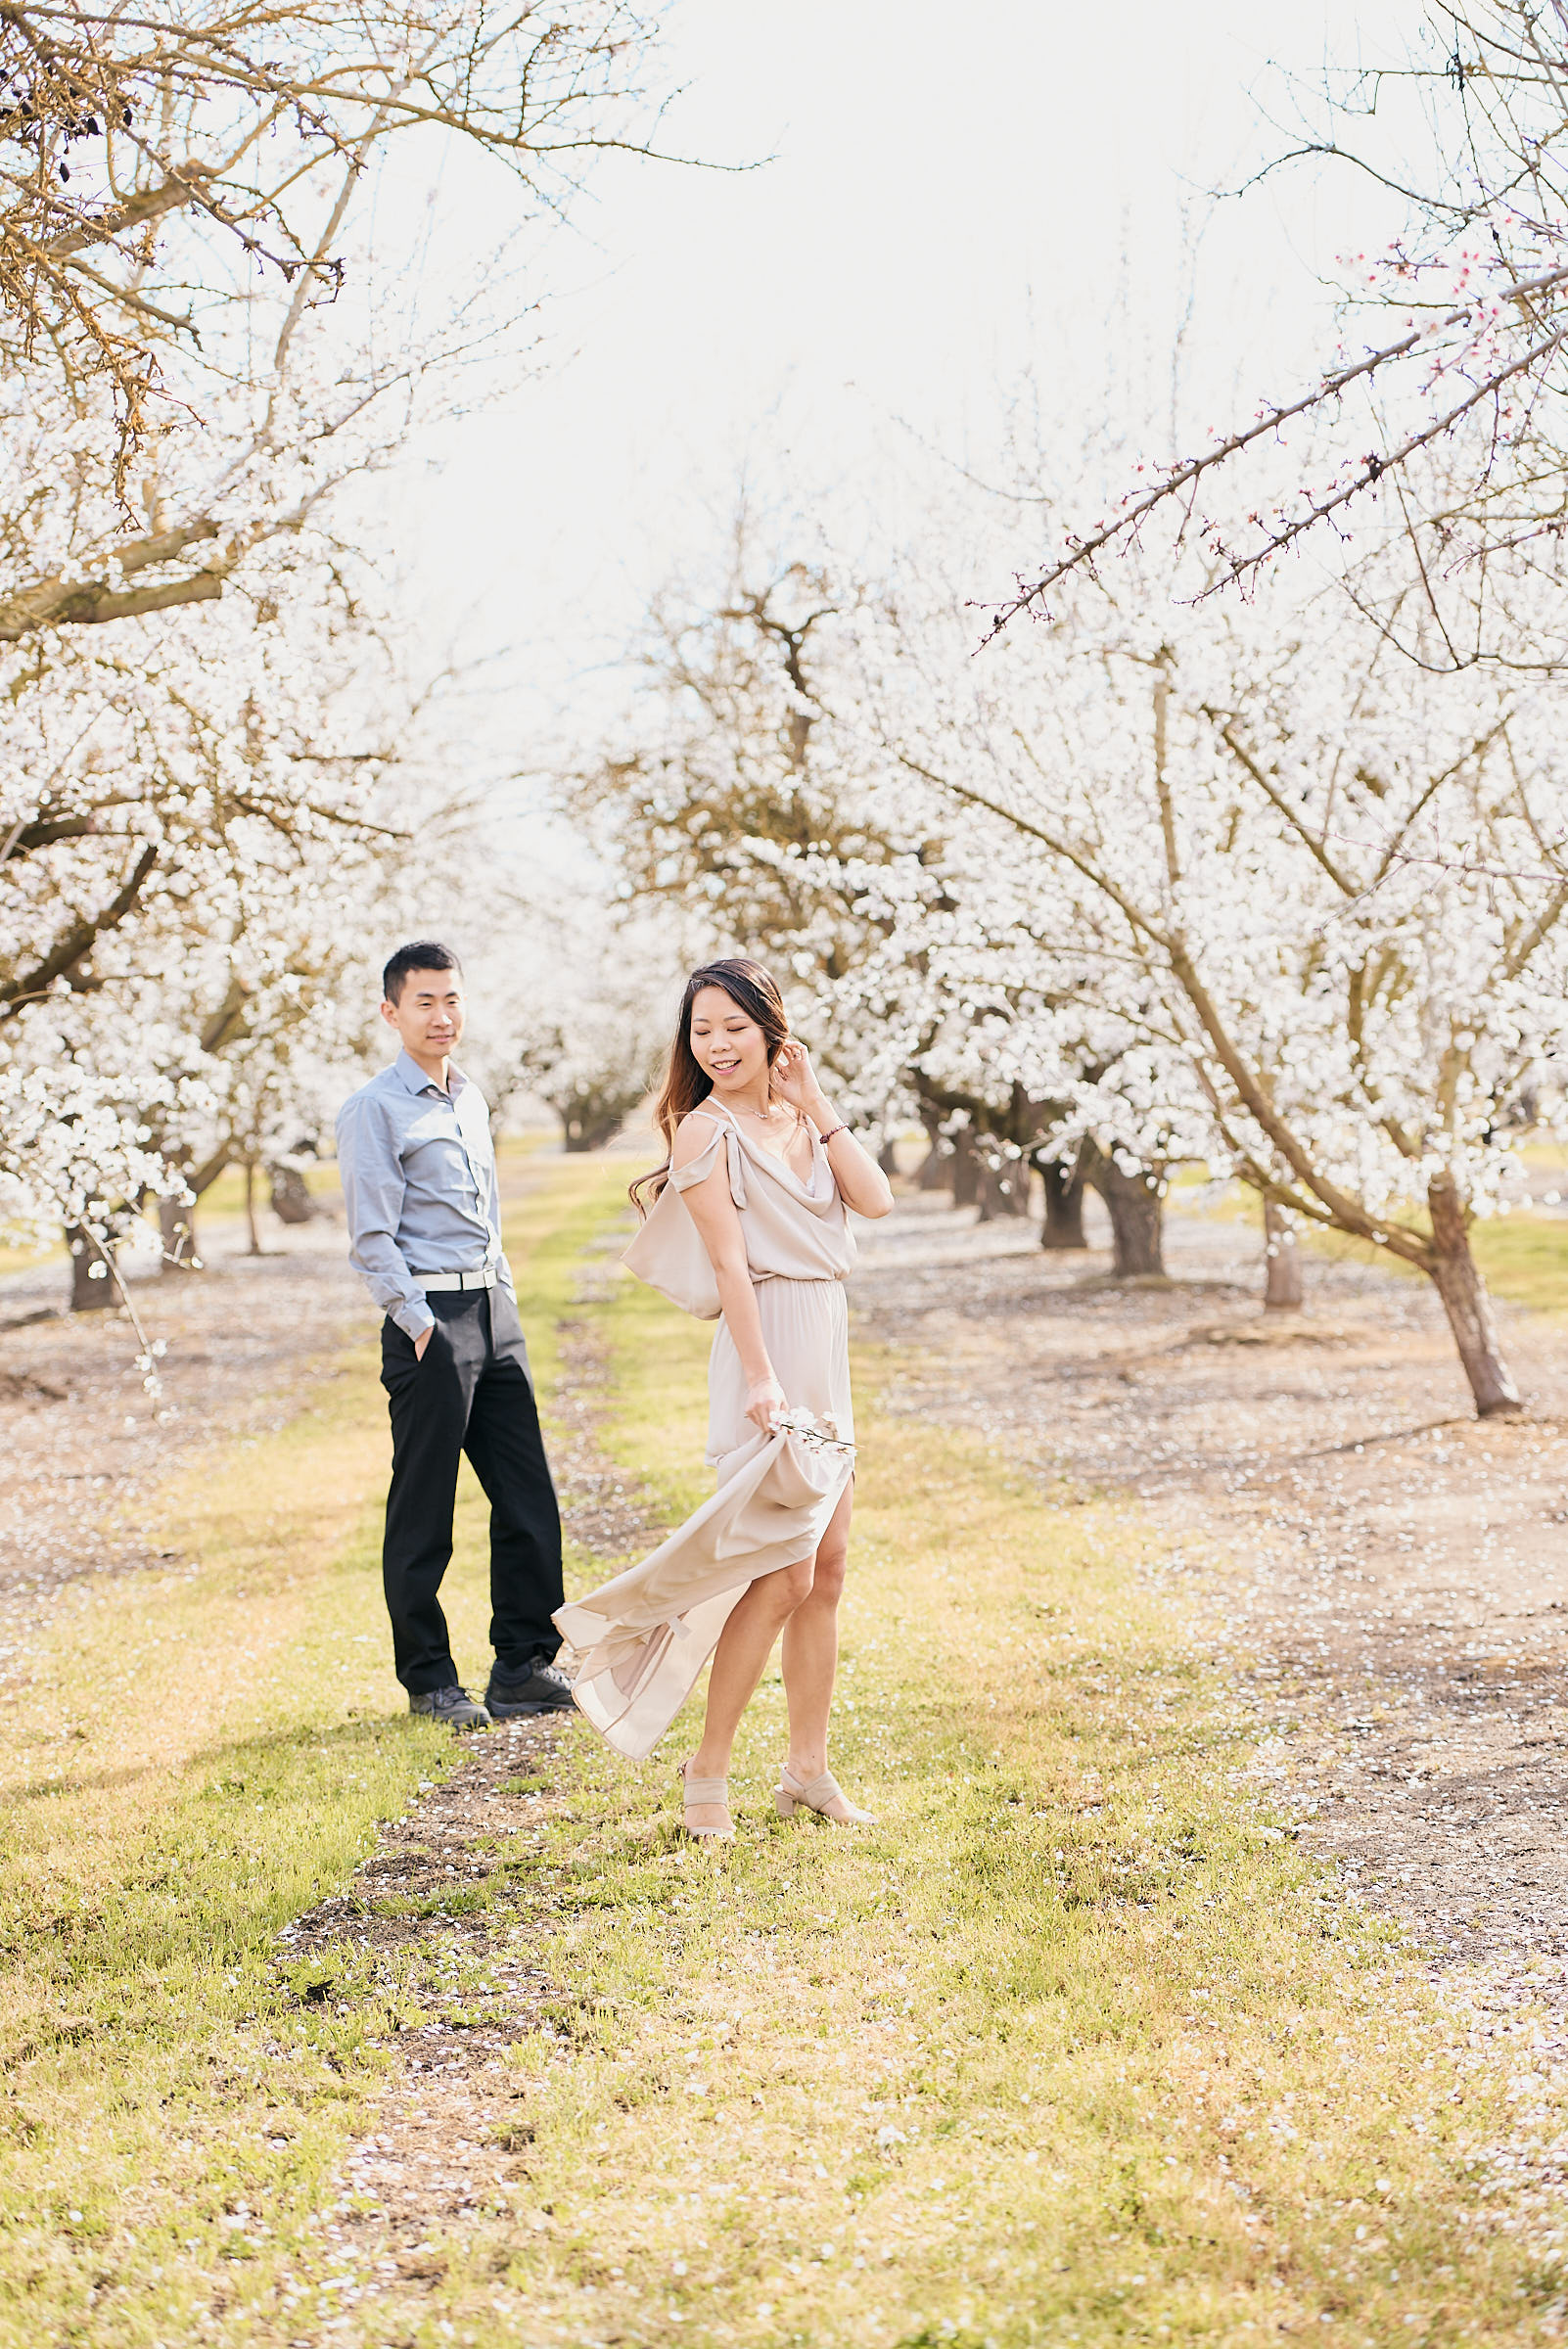 Cherry Blossom Engagement Photoshoot